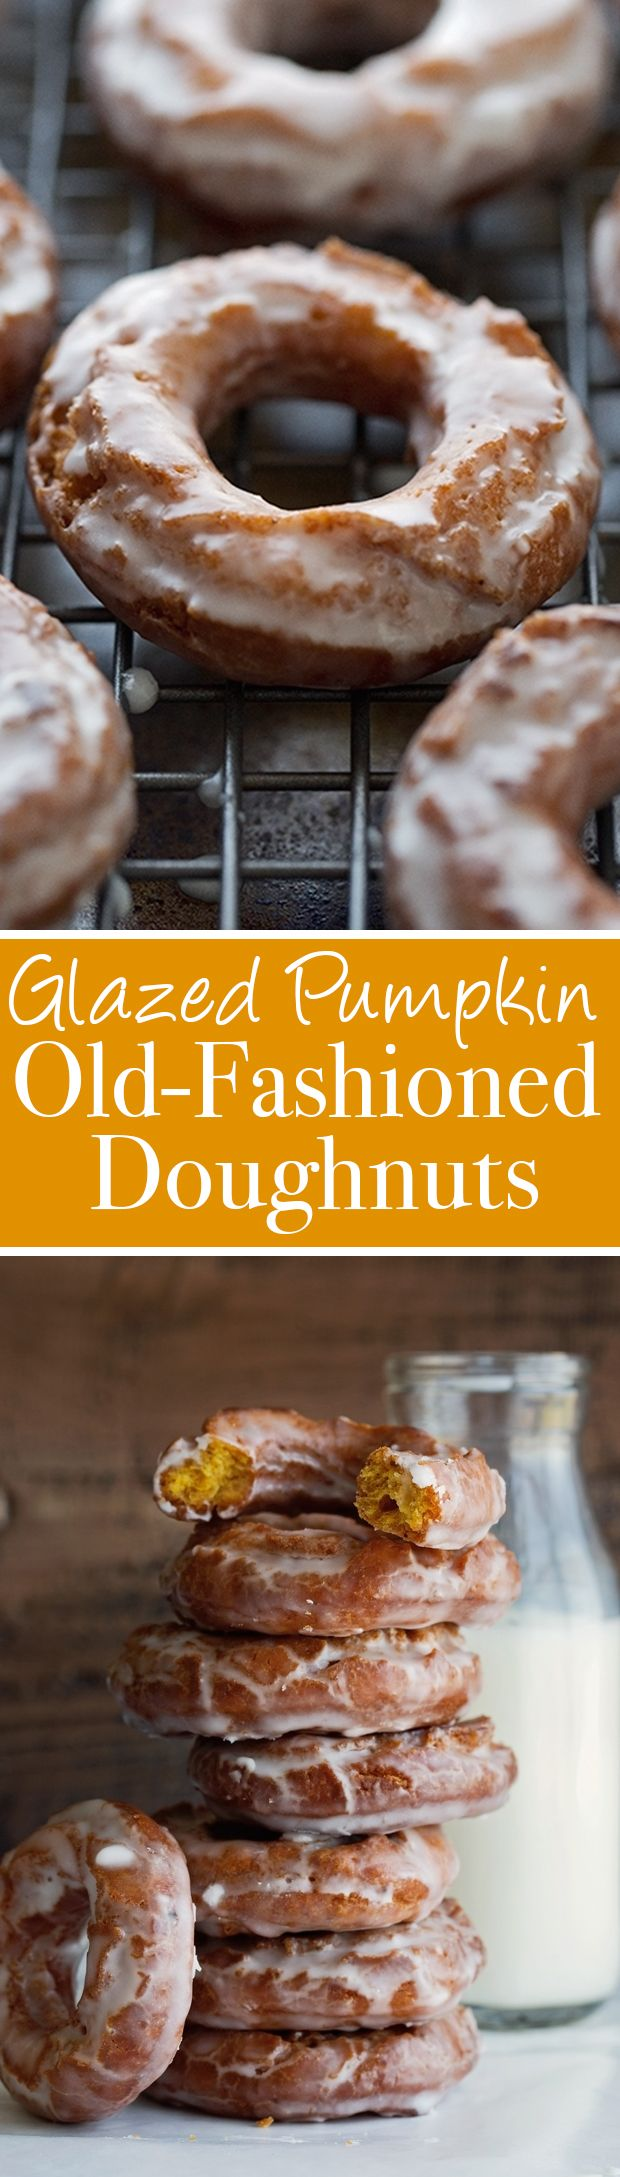 Old-Fashioned Pumpkin Doughnuts with Glaze